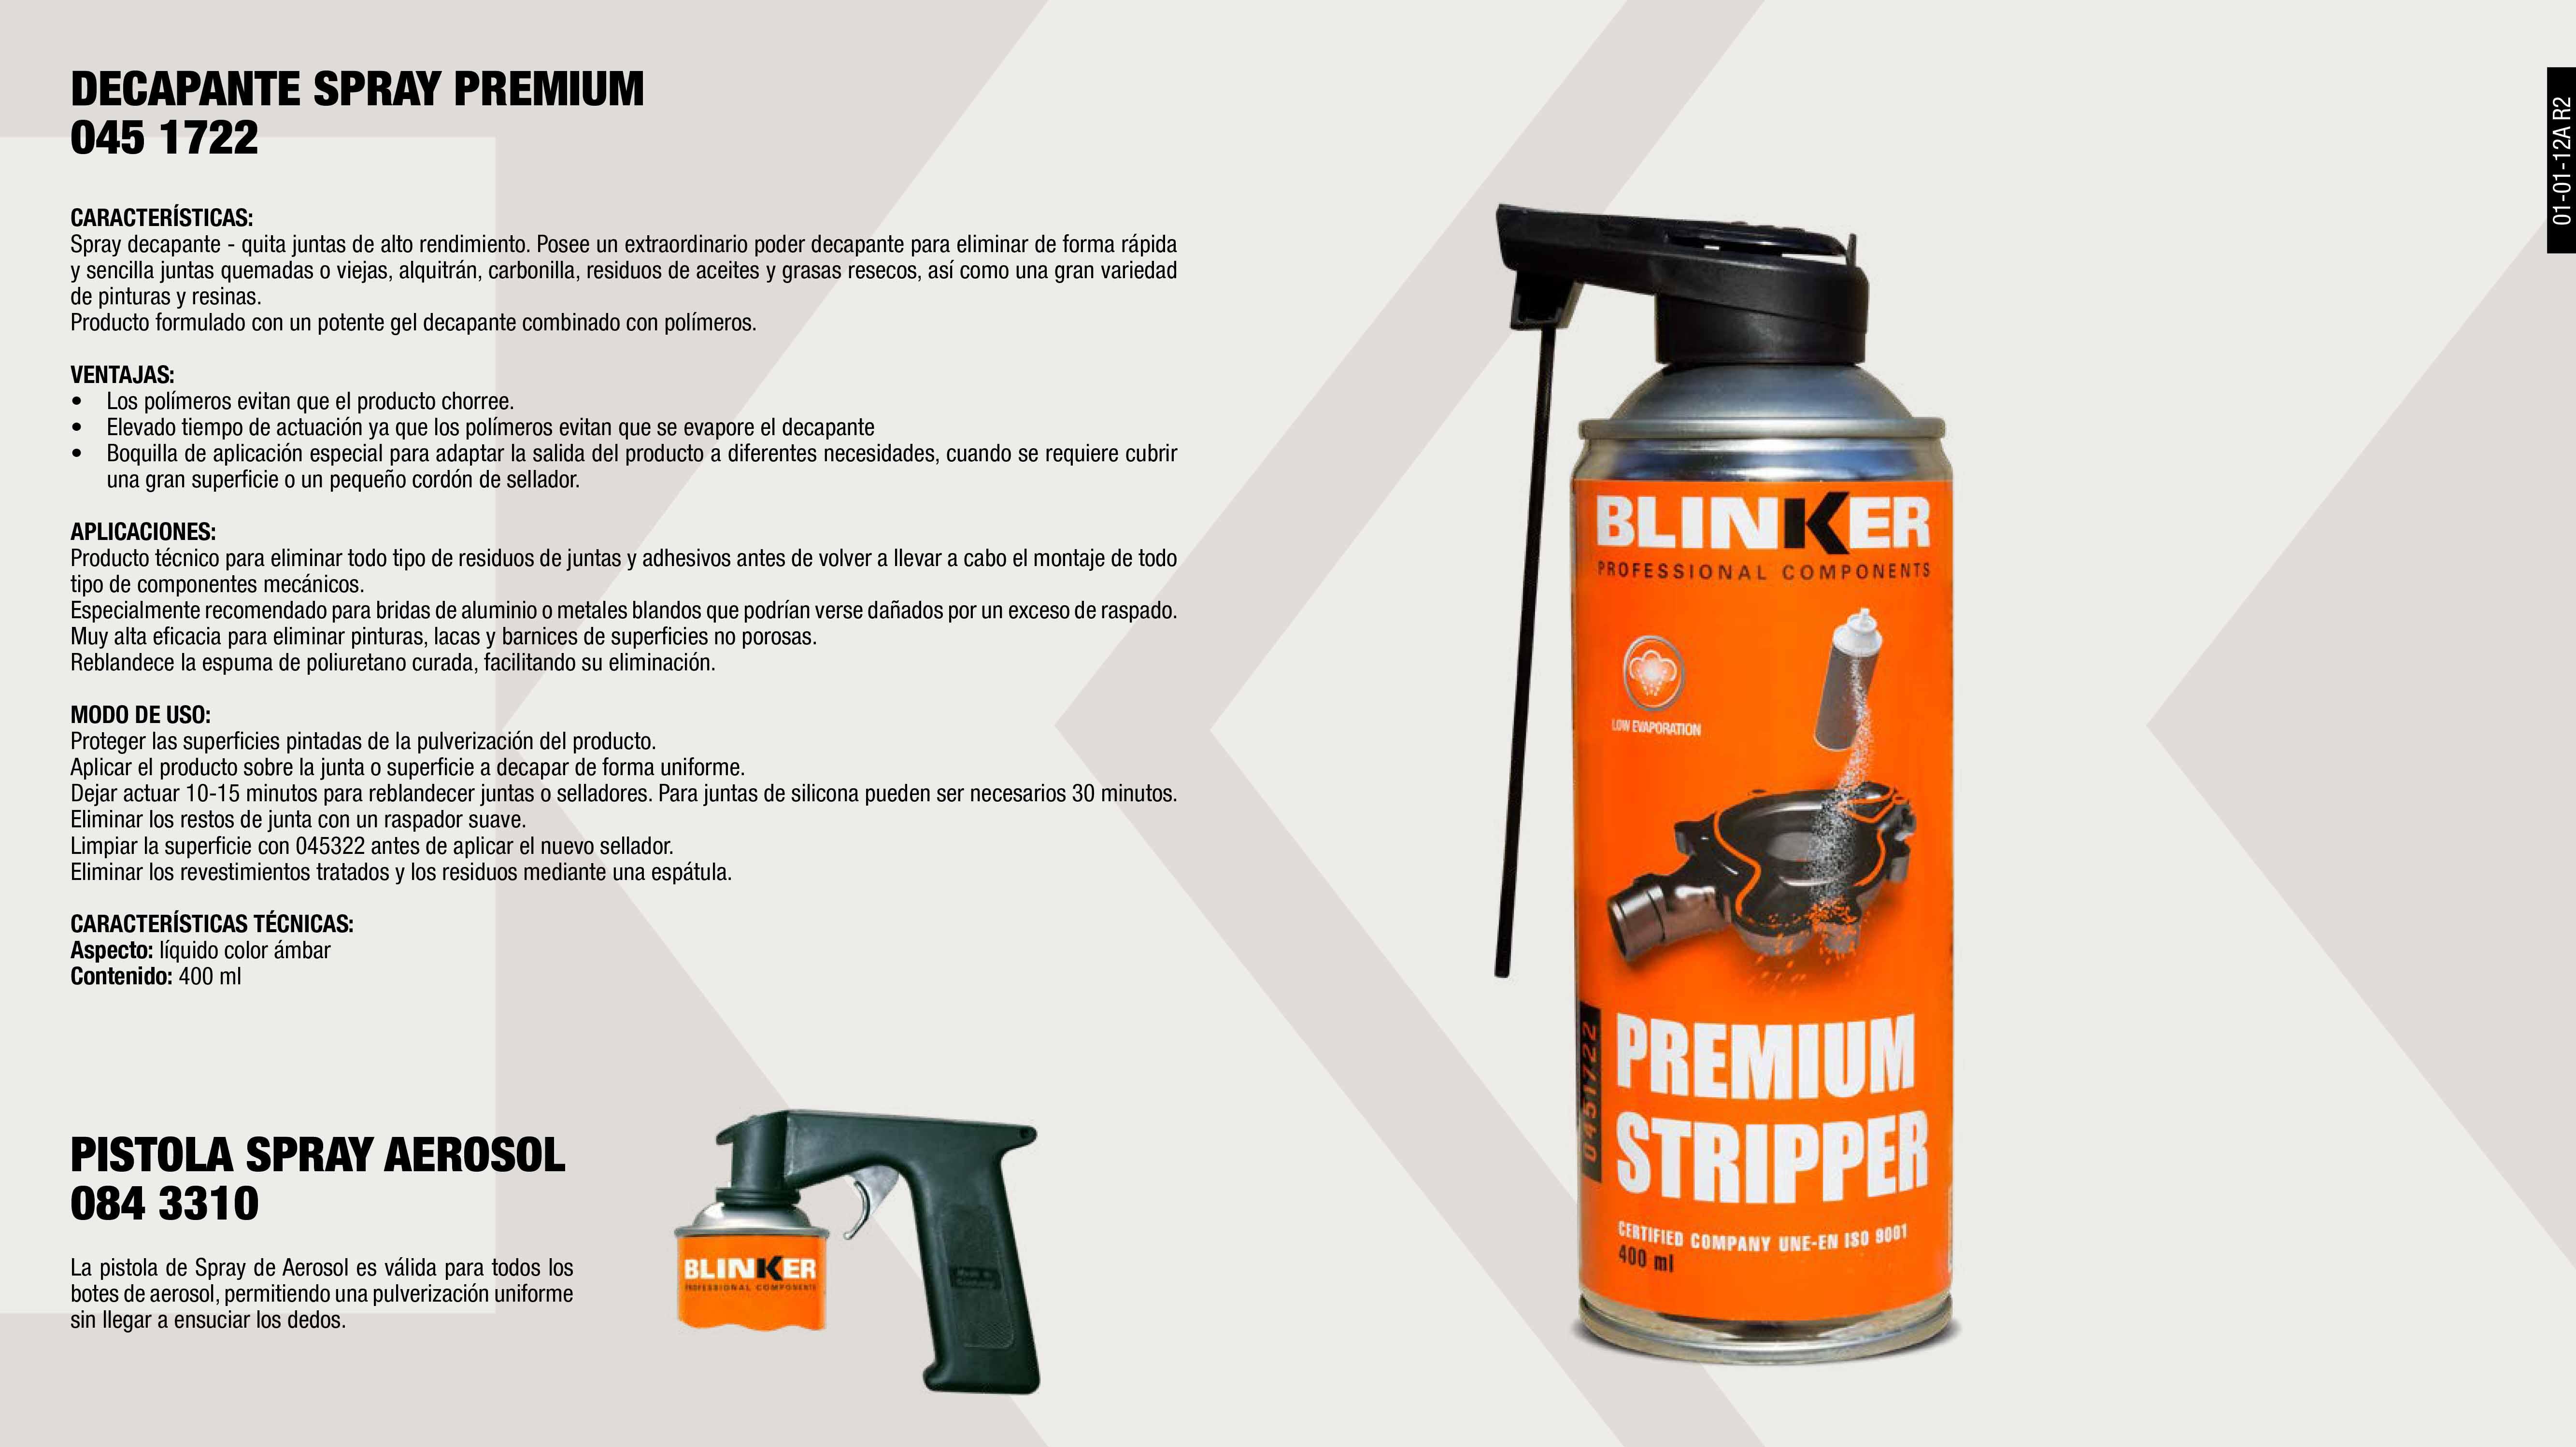 QUITA JUNTAS BLINKER 300ML.                                 ,